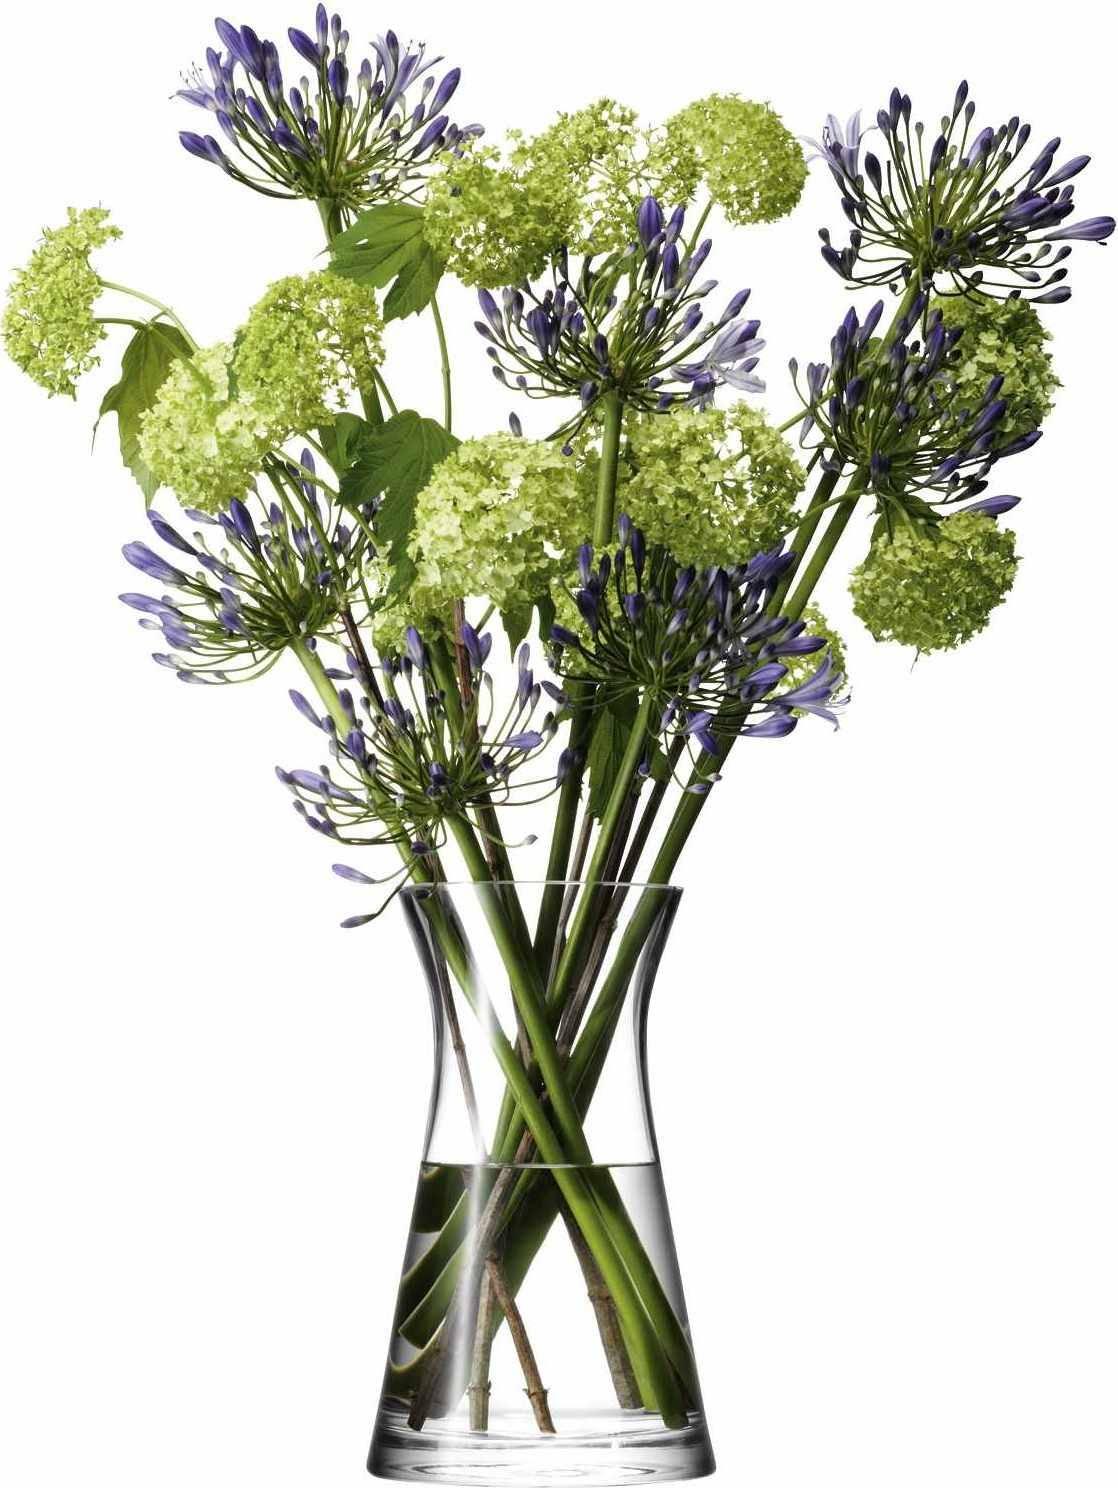 LSA Flower  skleněnáváza vysoká, 29cm, čirá, Handmade G667-29-301 LSA International